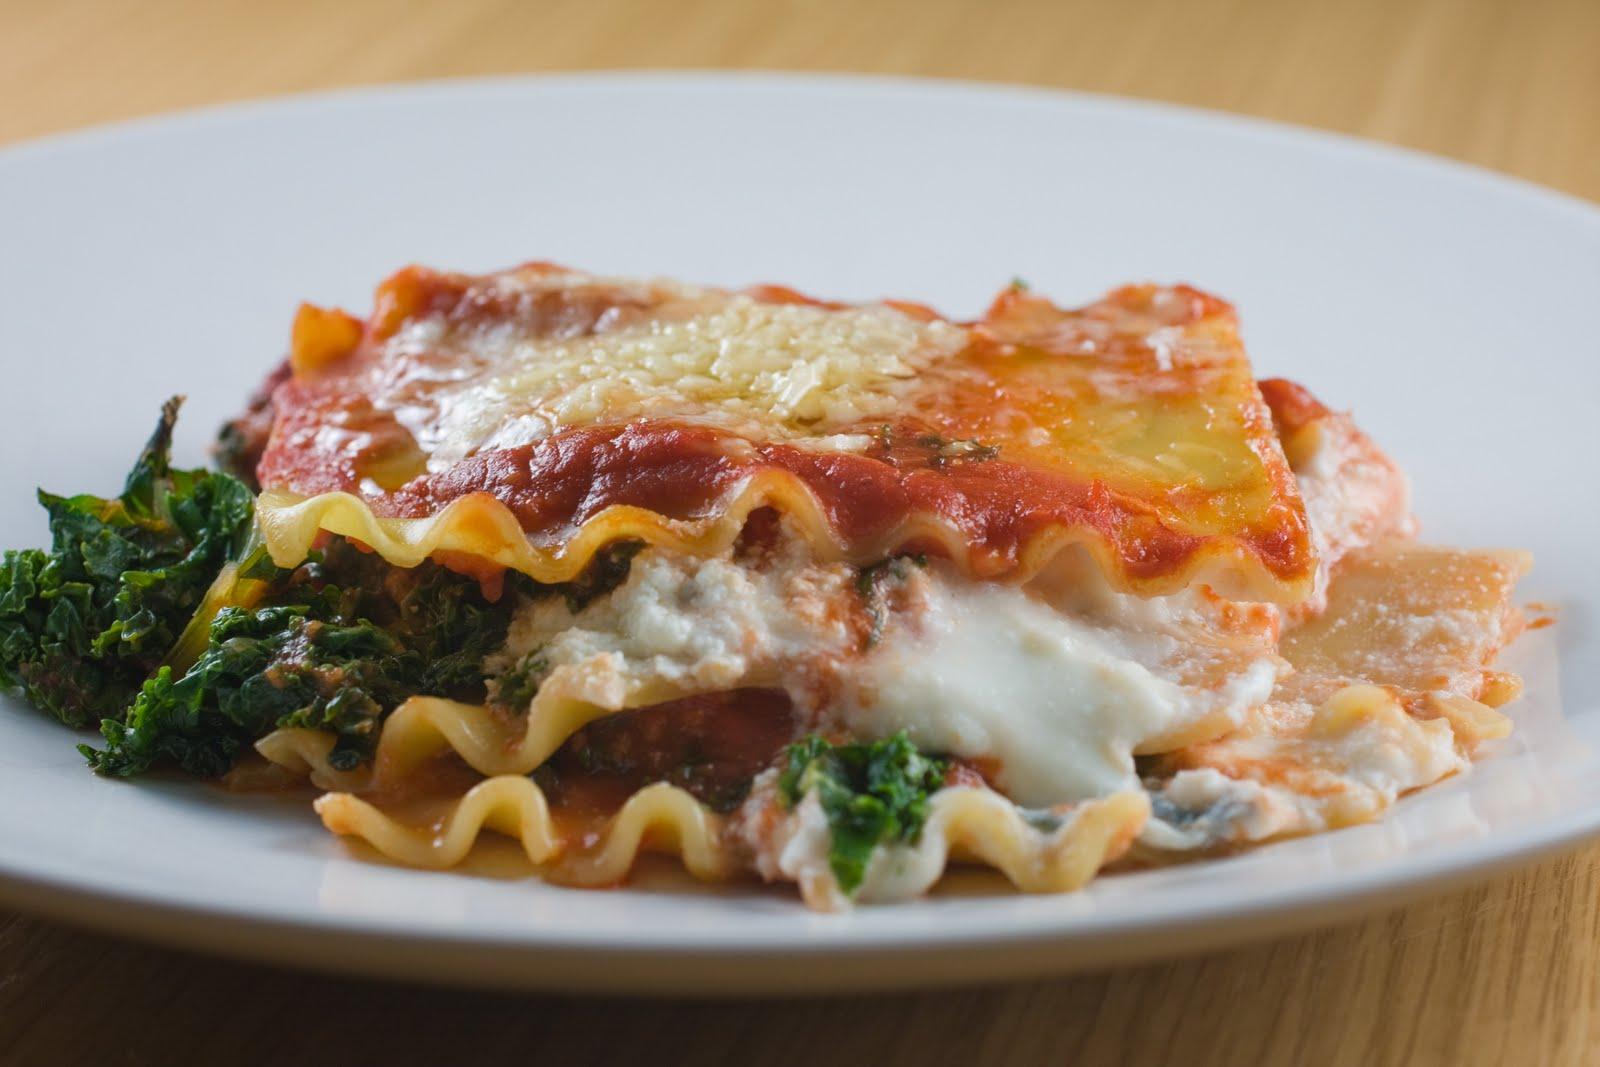 JUST VEGGING OUT: Kale Lasagna Diavolo